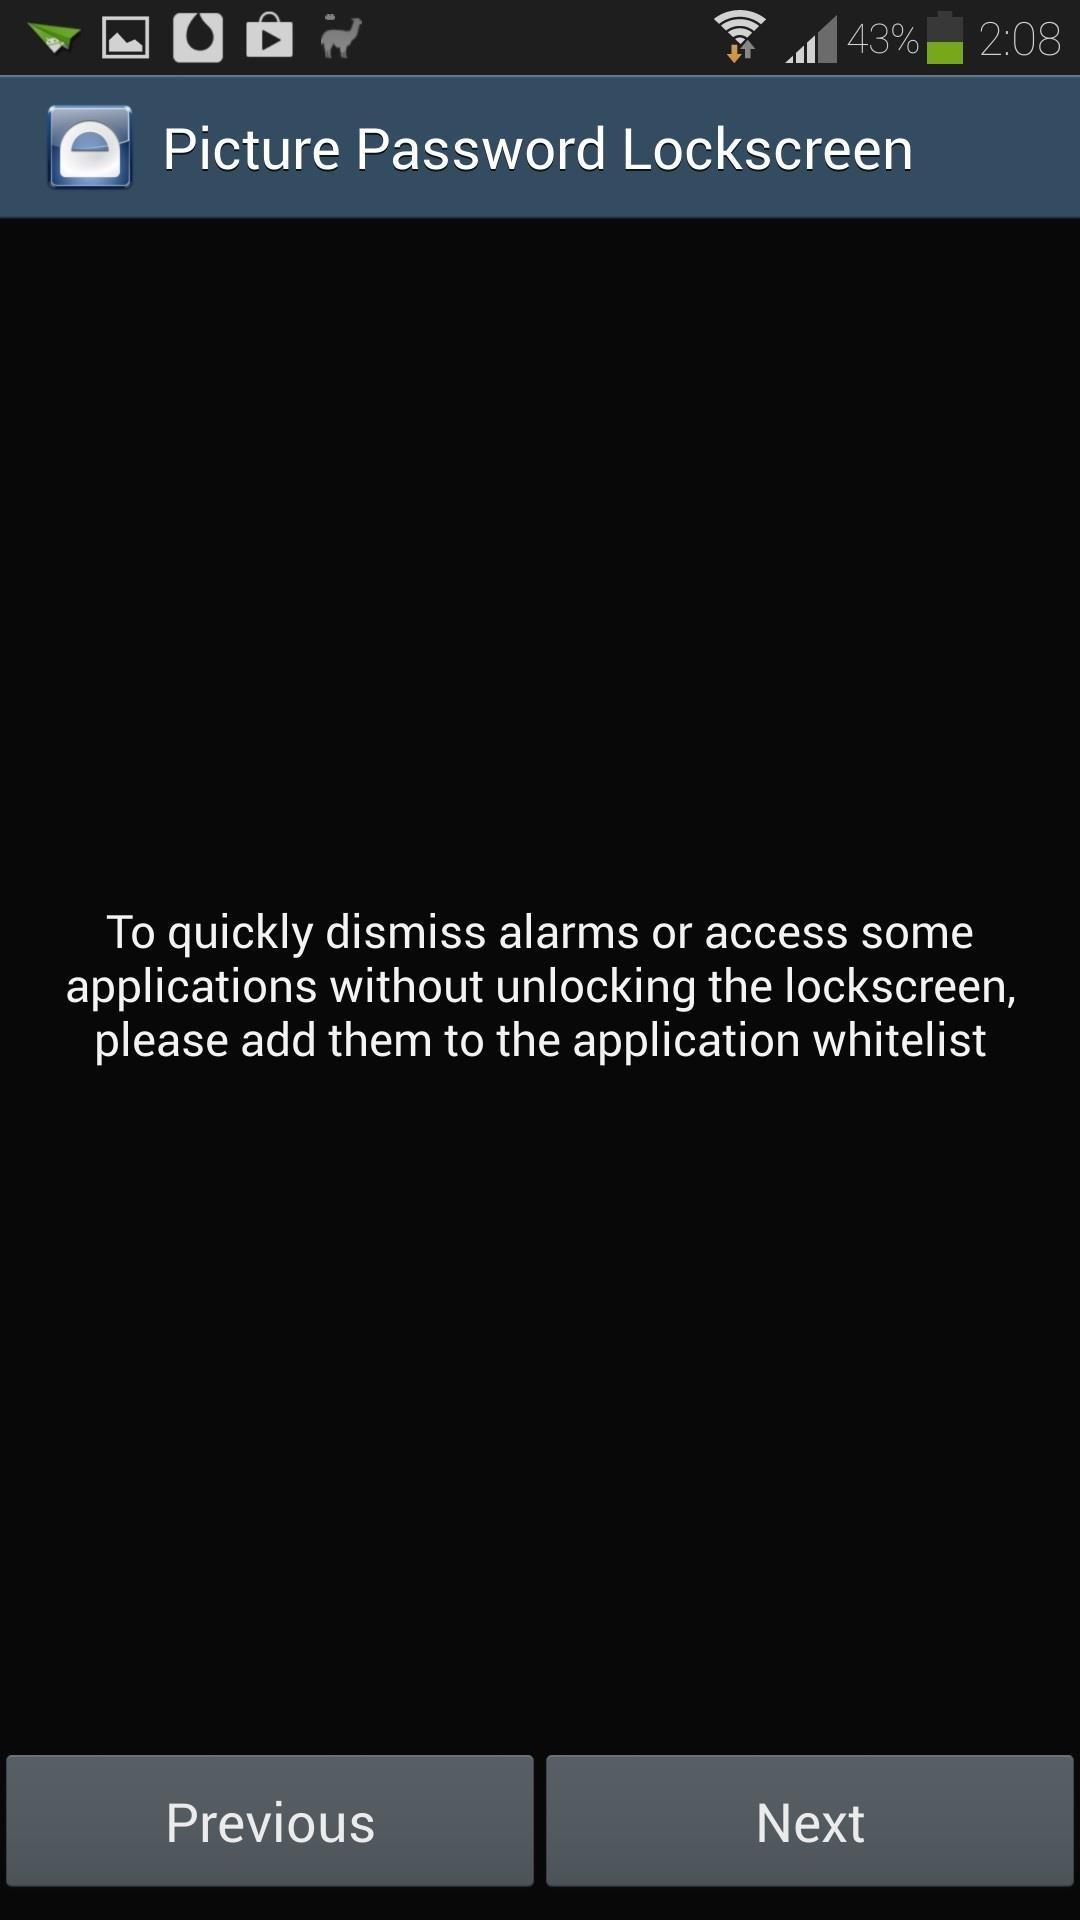 How to Unlock Your Samsung Galaxy S4 Using Customizable Swipe Gestures